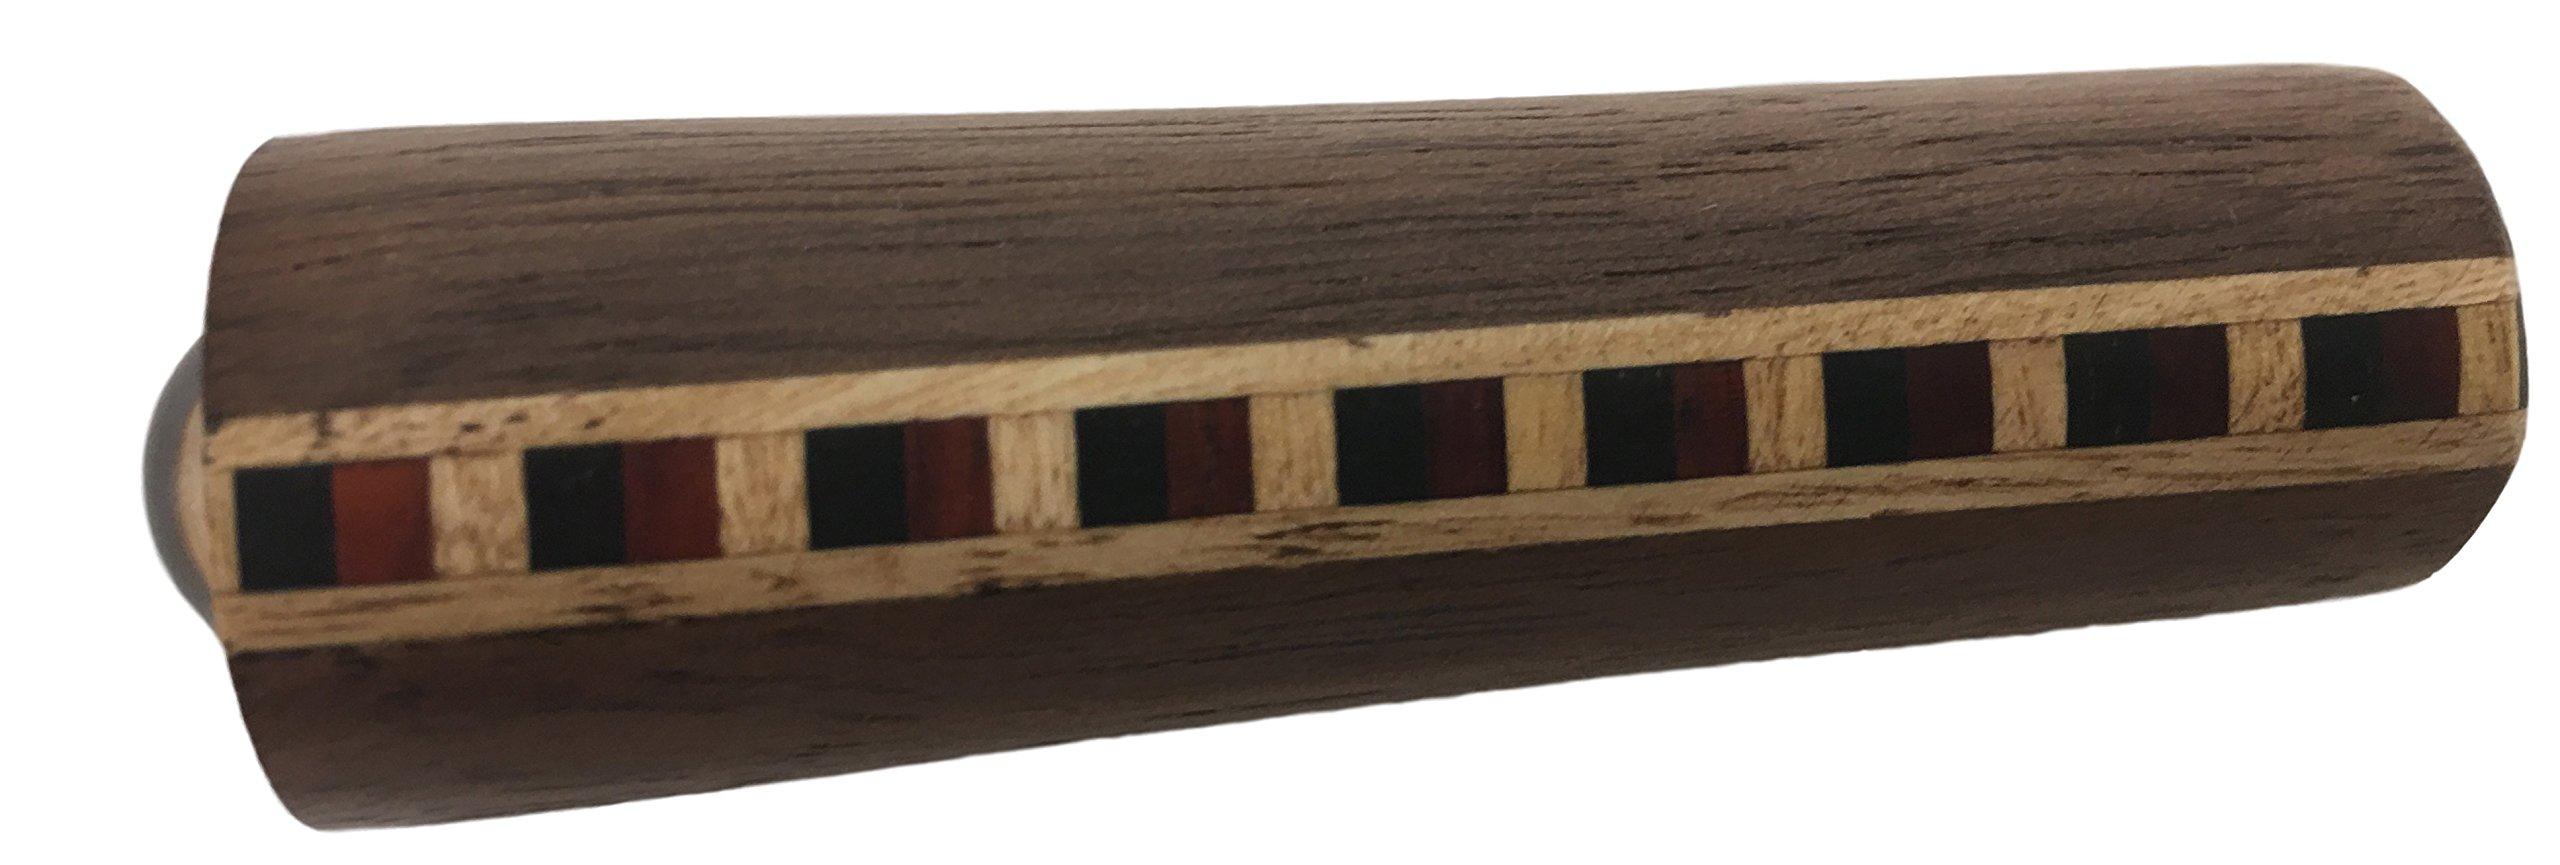 N & J Kaleidoscope Teleidoscope in Solid Walnut Wood, MINI 3 Inch, Inliad Band of Padauk, Ebony and Jalneem